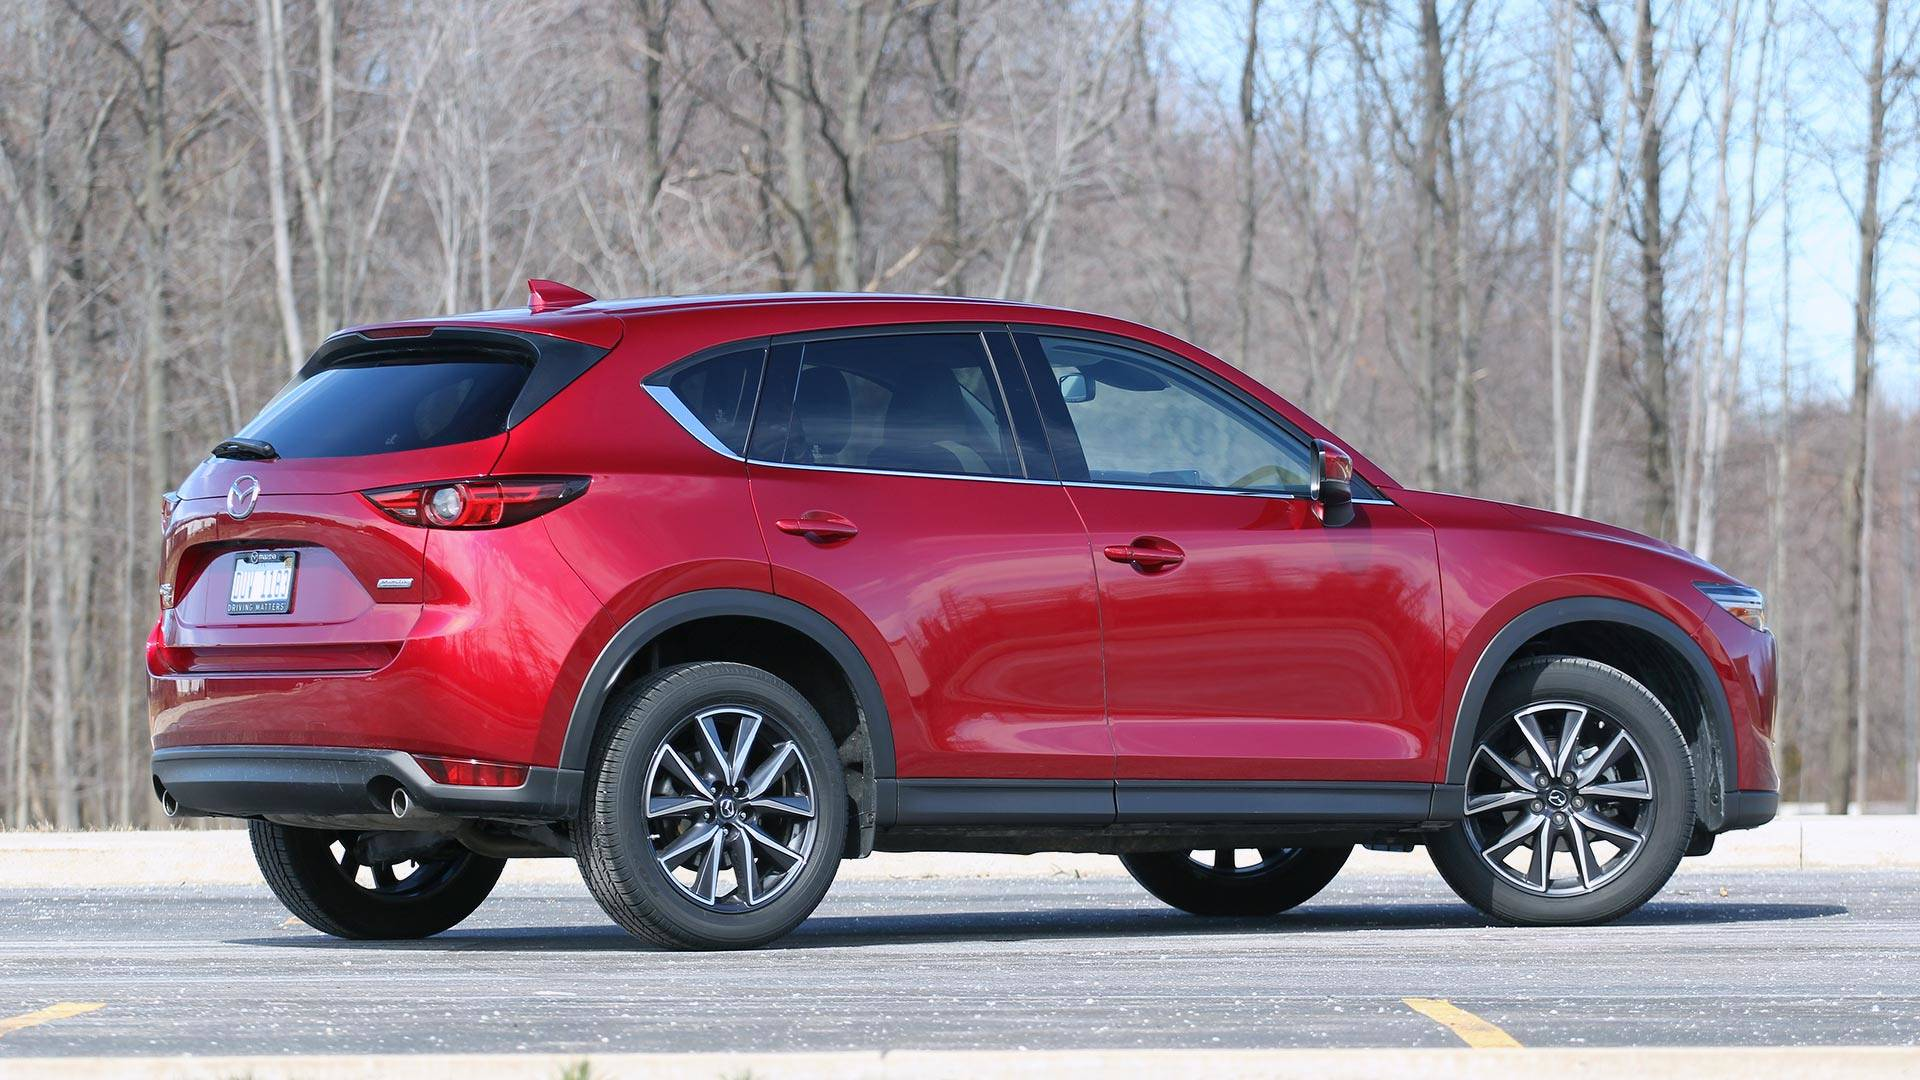 2018 Mazda CX 5 Review Trailing Its Own Triumph